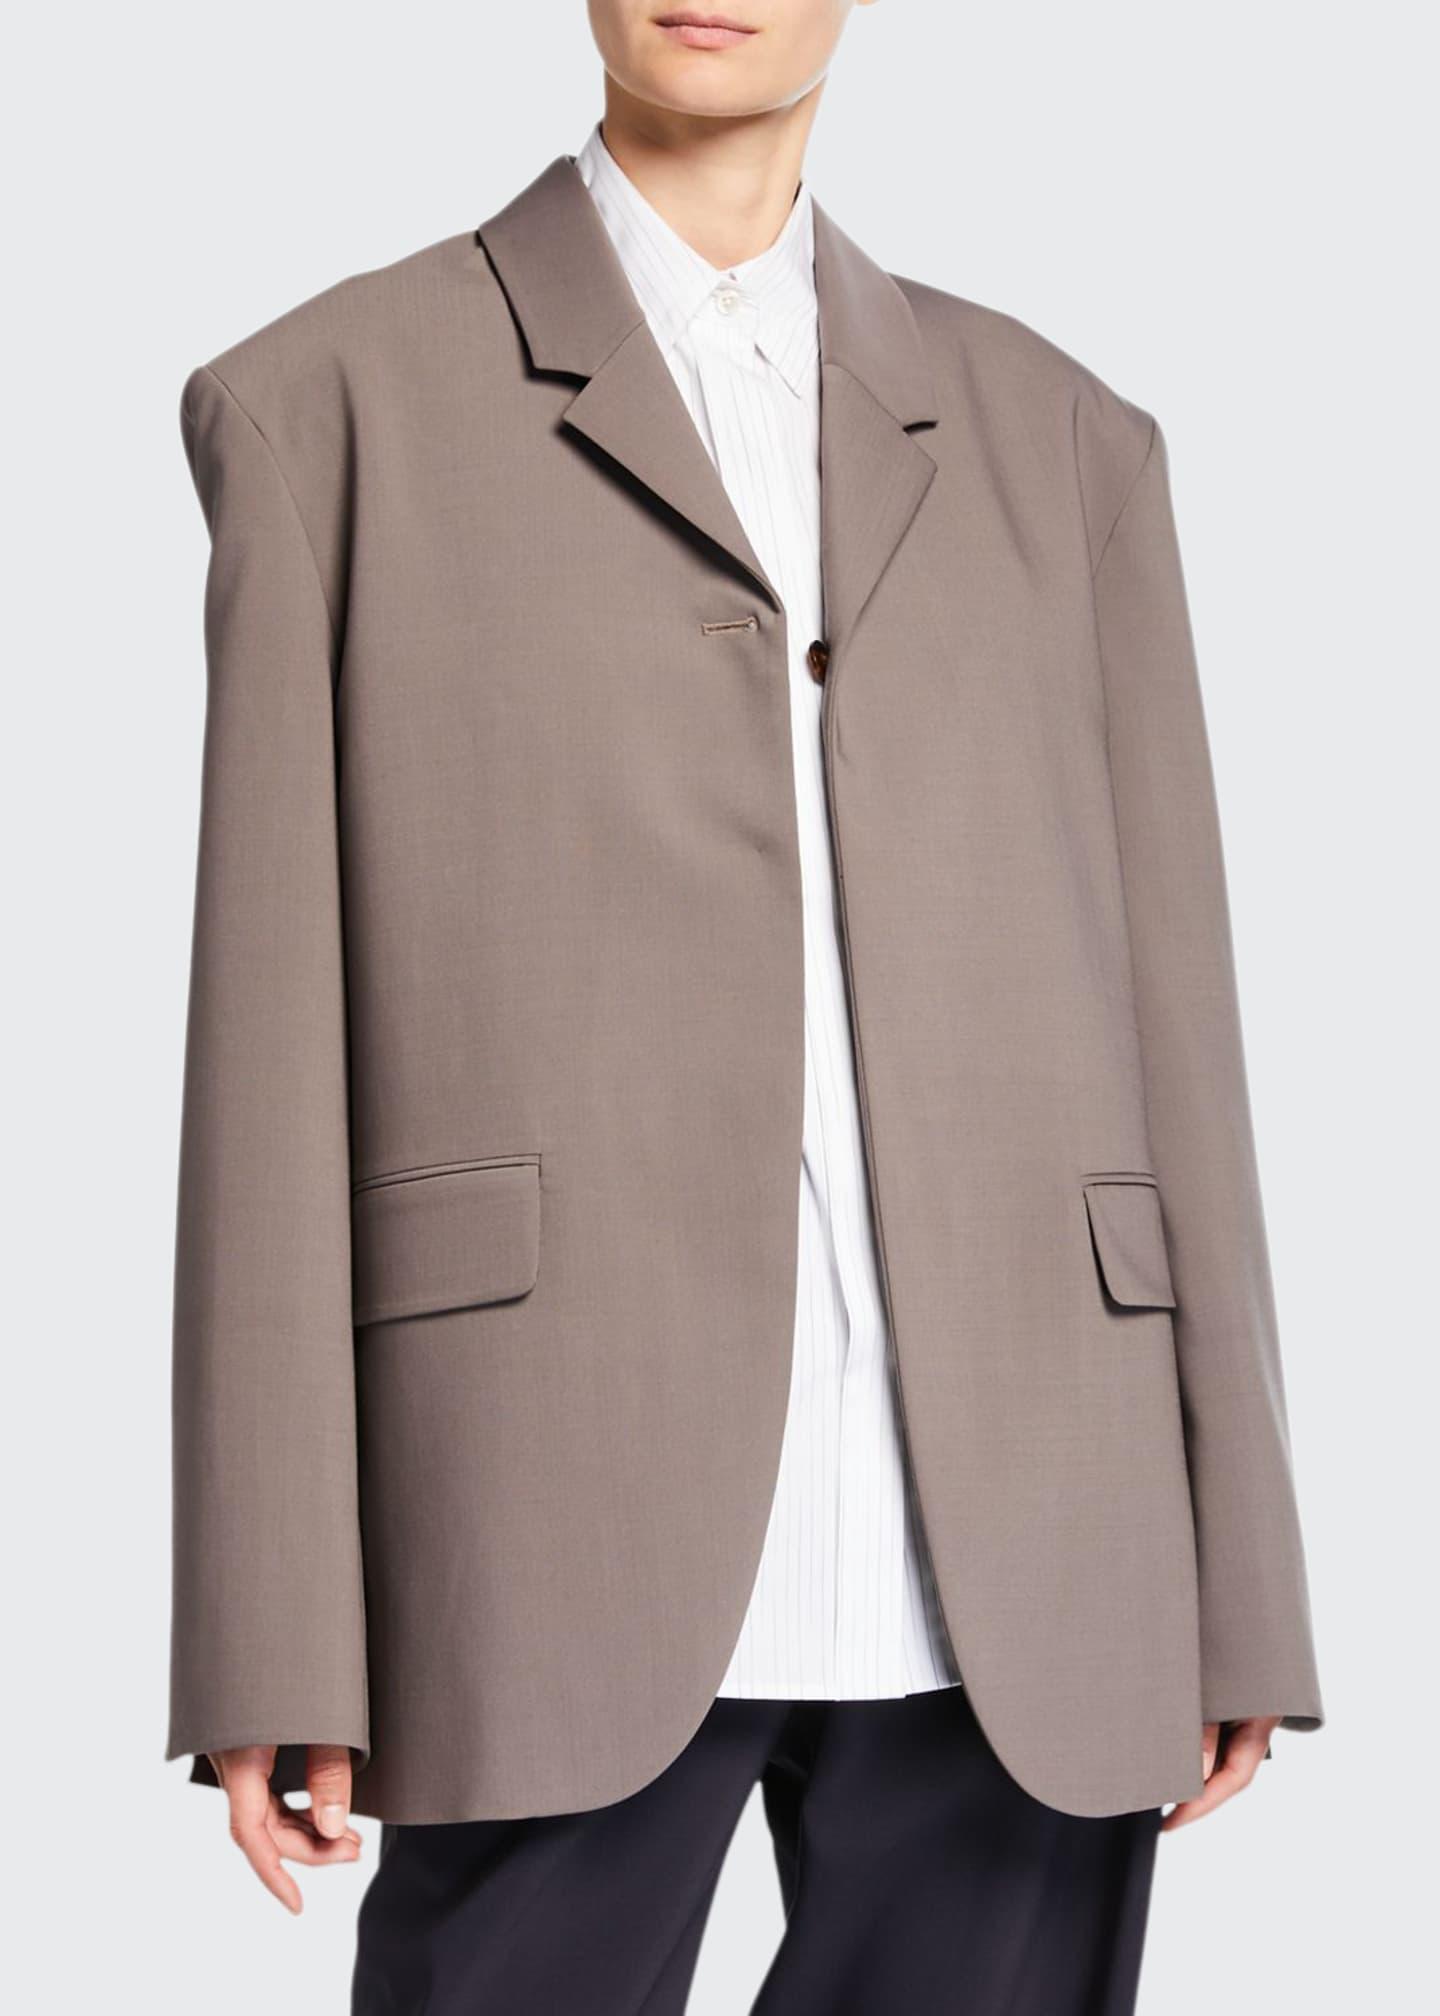 Deveaux New York Kyle Bonded Wool Jacket